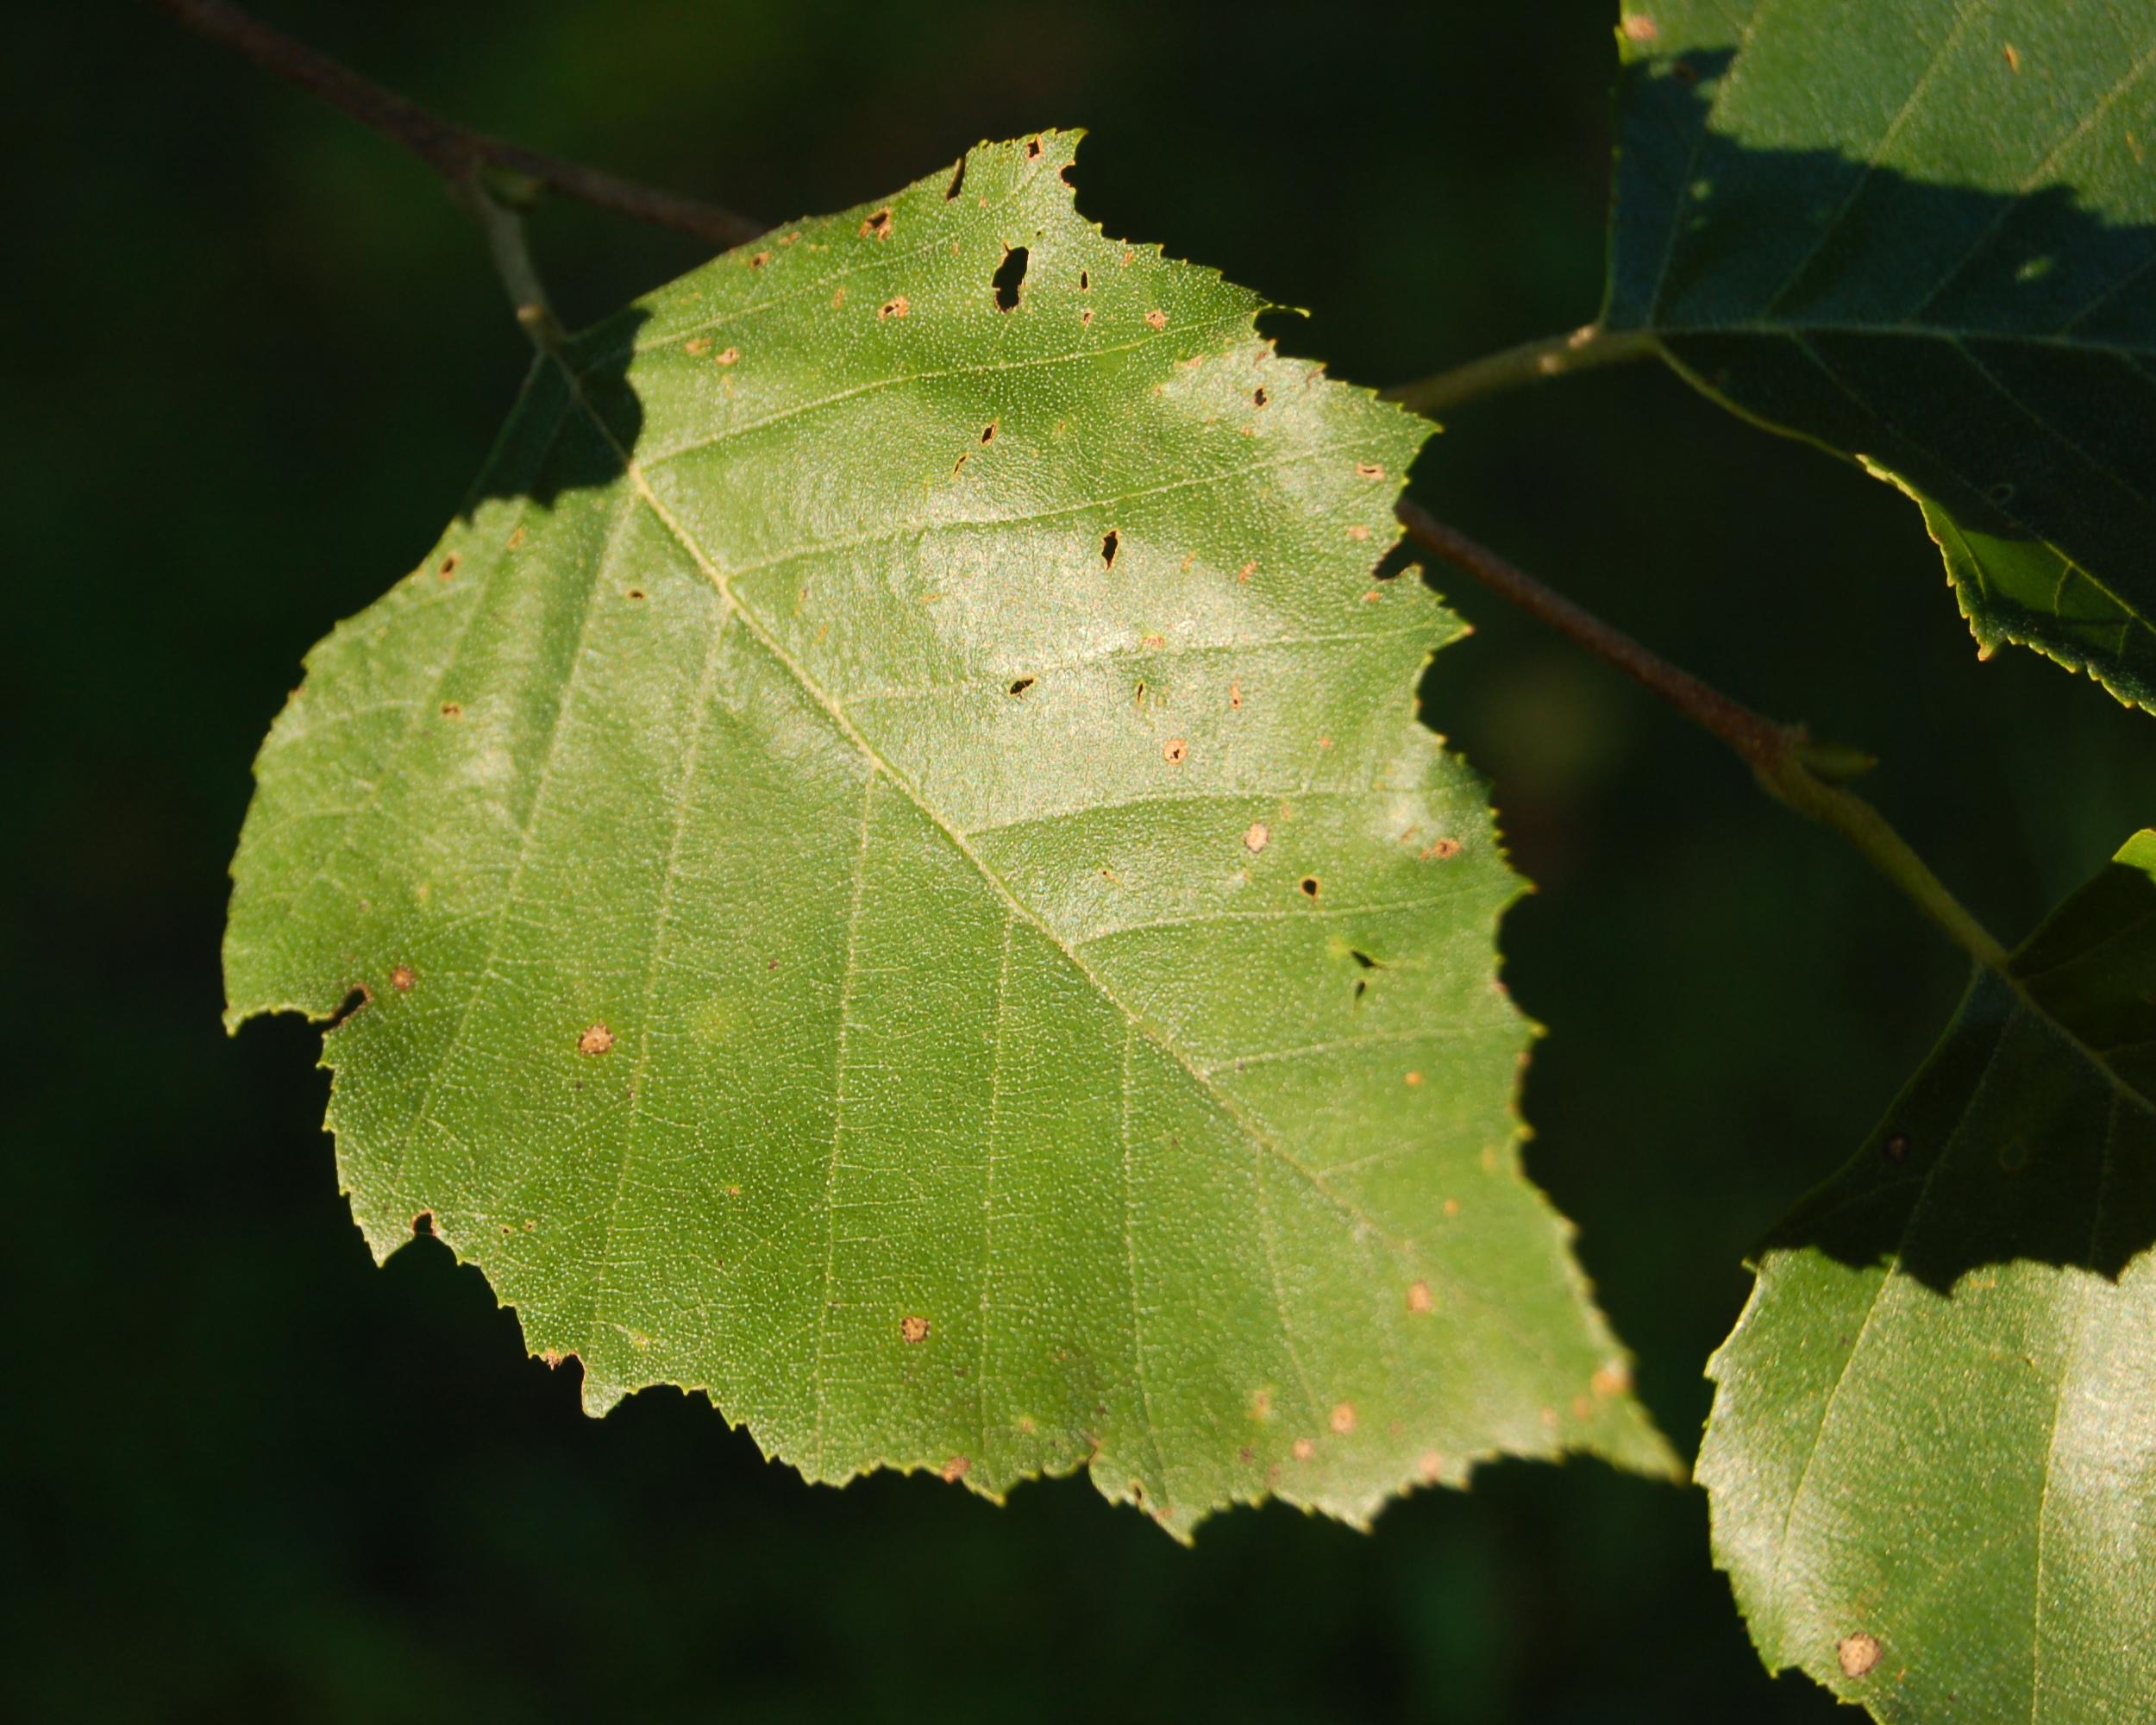 leaf river milfs dating site Bahasa indonesia - indonesian čeština - czech dansk - danish deutsch - german english (united states) español - spanish español (latinoamérica.